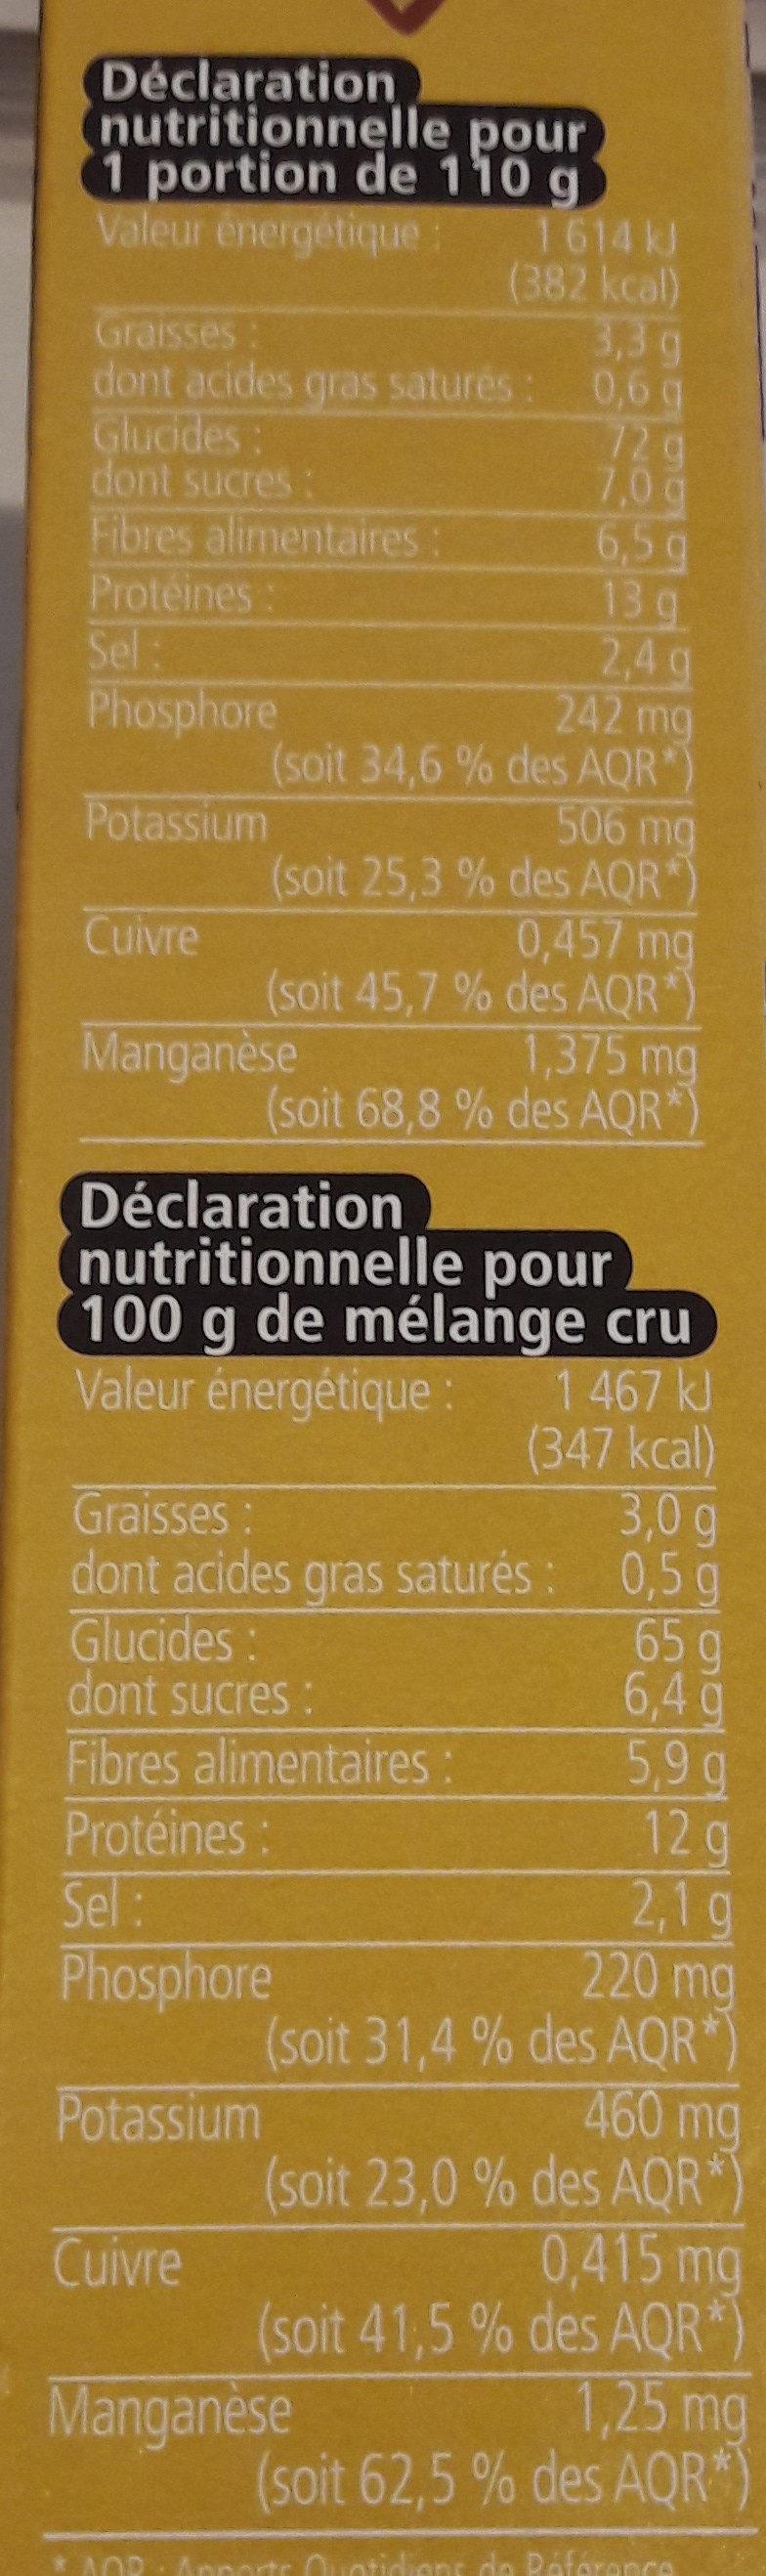 Riz facon zanzibar protéiné - Informations nutritionnelles - fr